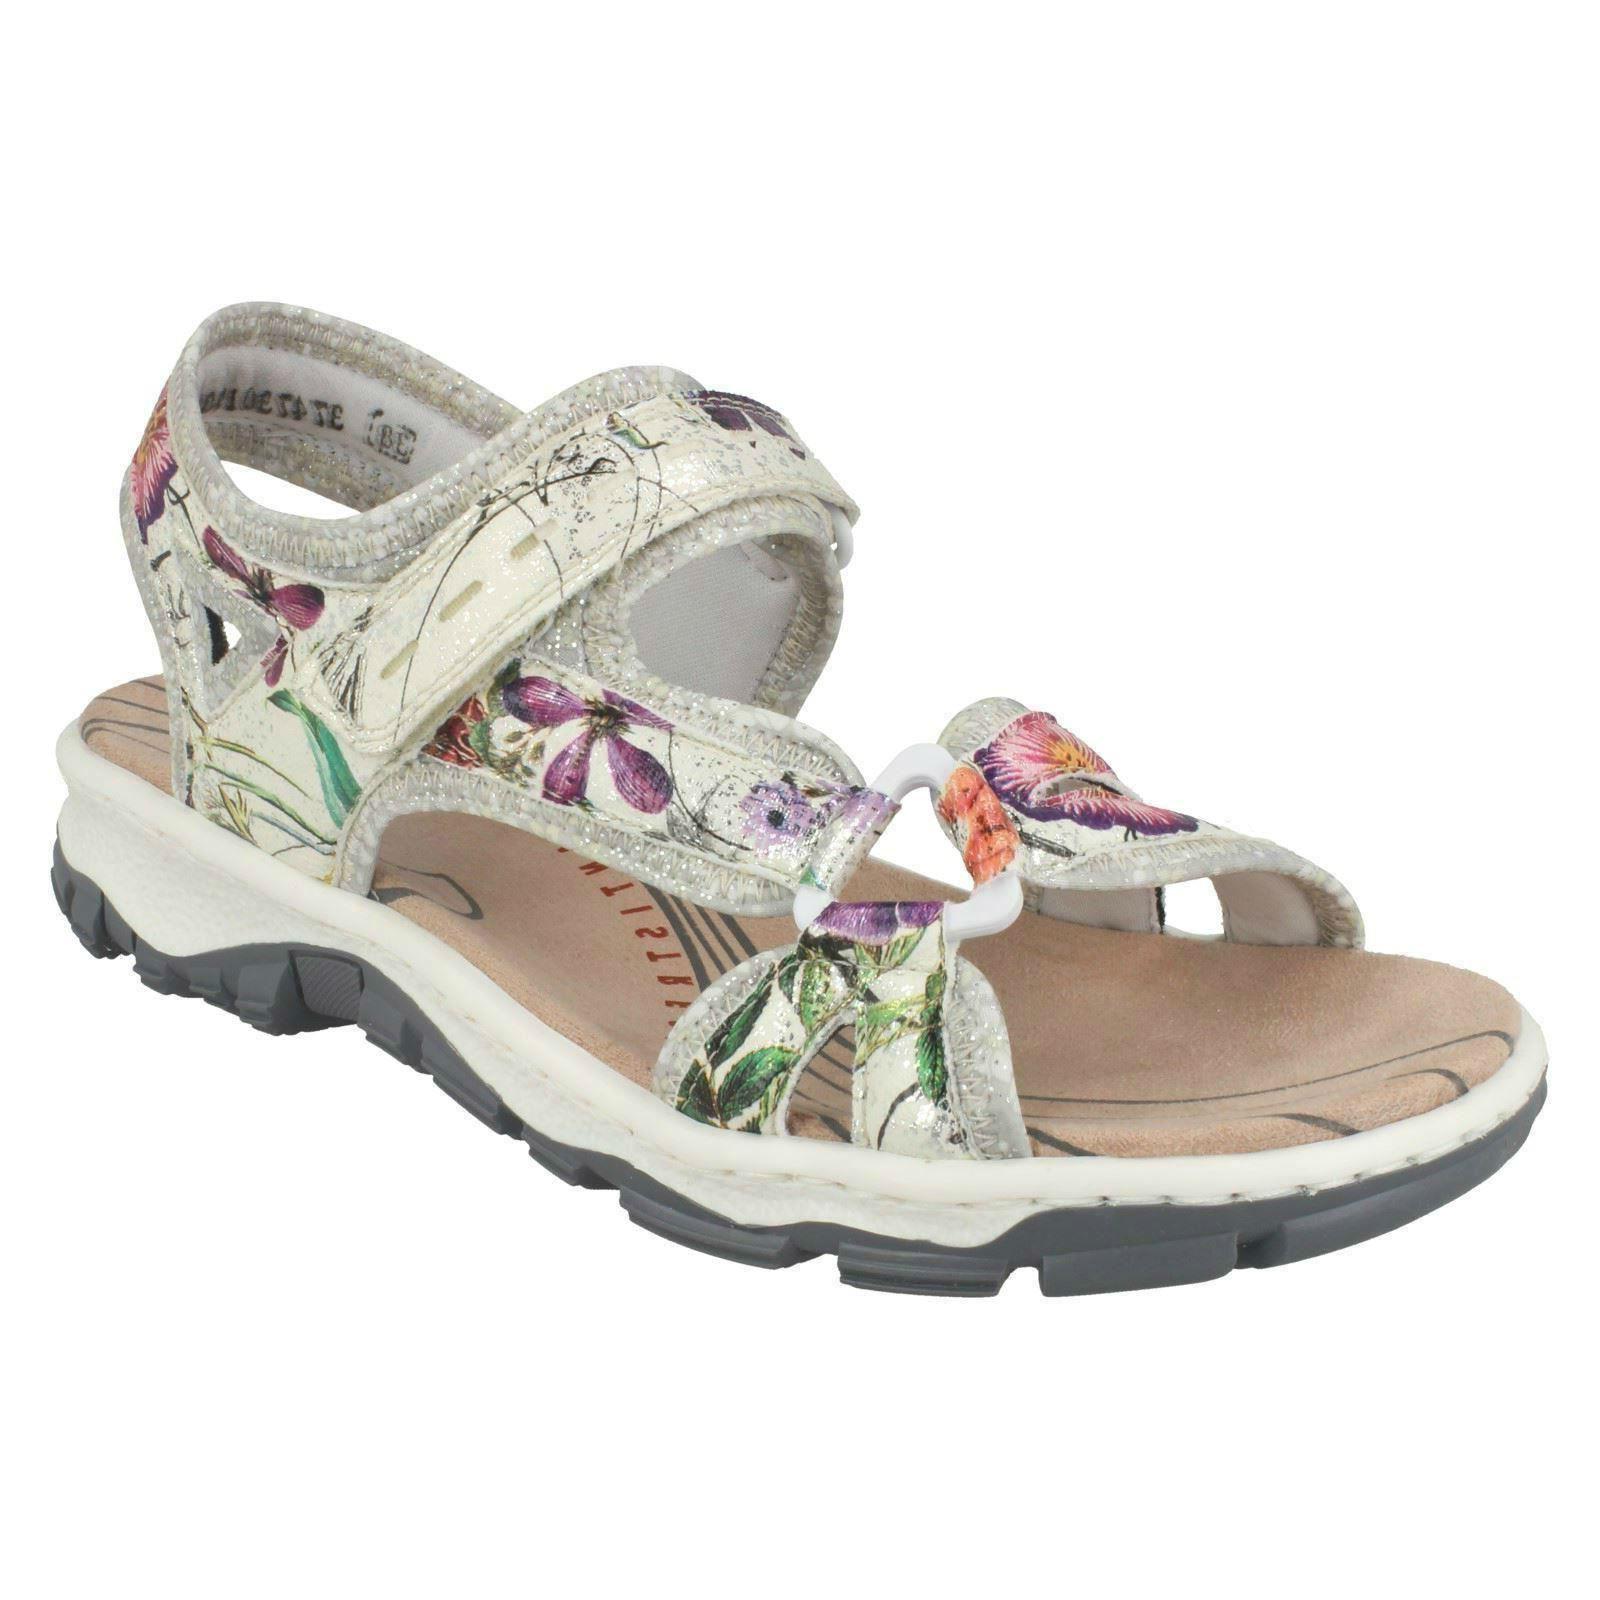 RIEKER LADIES 68879 RIPTAPE HIKING WALKING BEACH Schuhe CASUAL SLINGBACK SANDALS